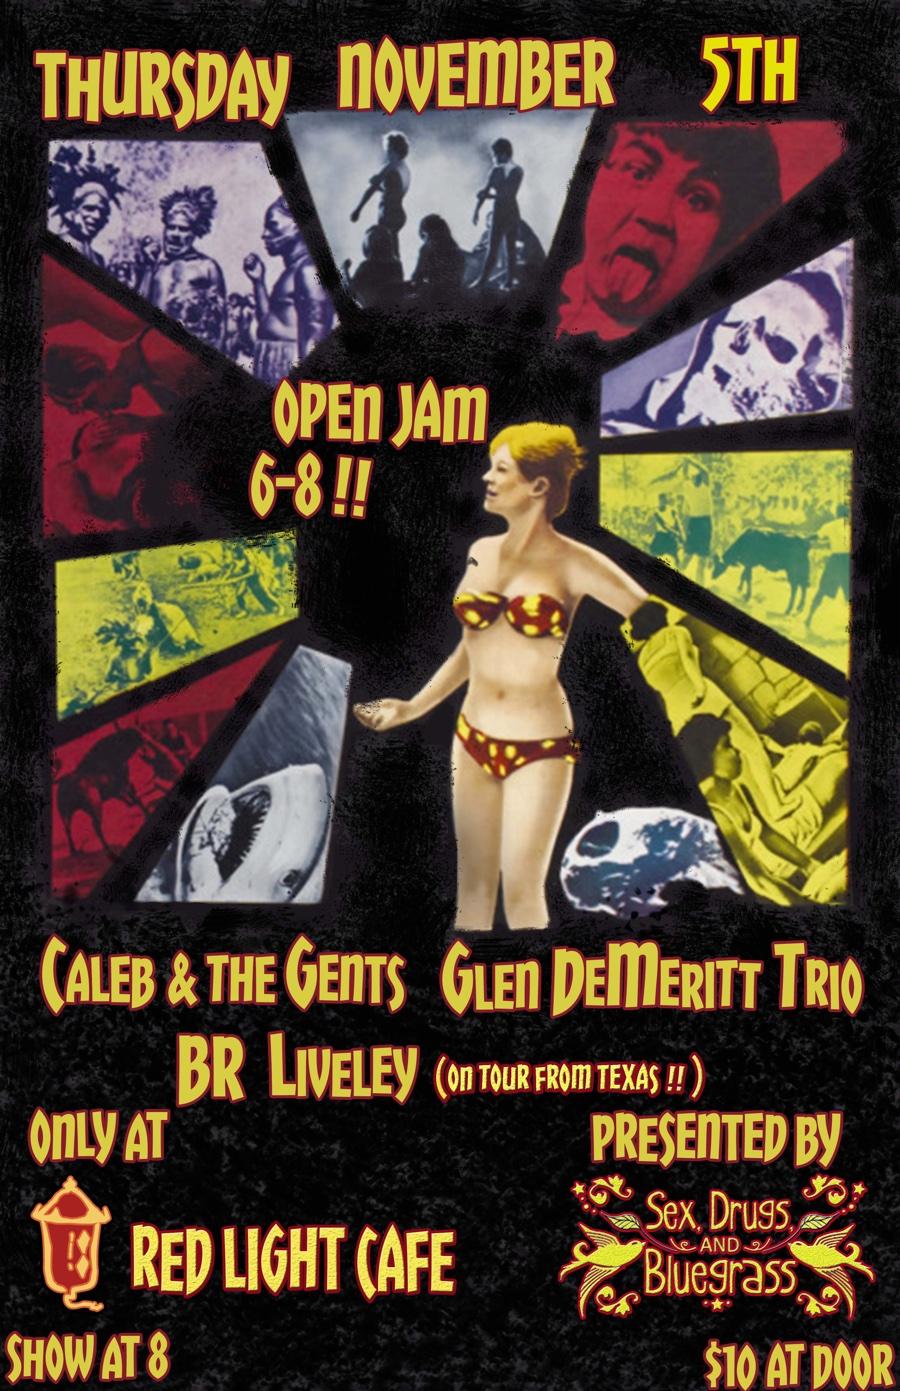 Caleb & The Gents + Glen DeMeritt Trio + B.R. Lively — November 5, 2015 — Red Light Café, Atlanta, GA